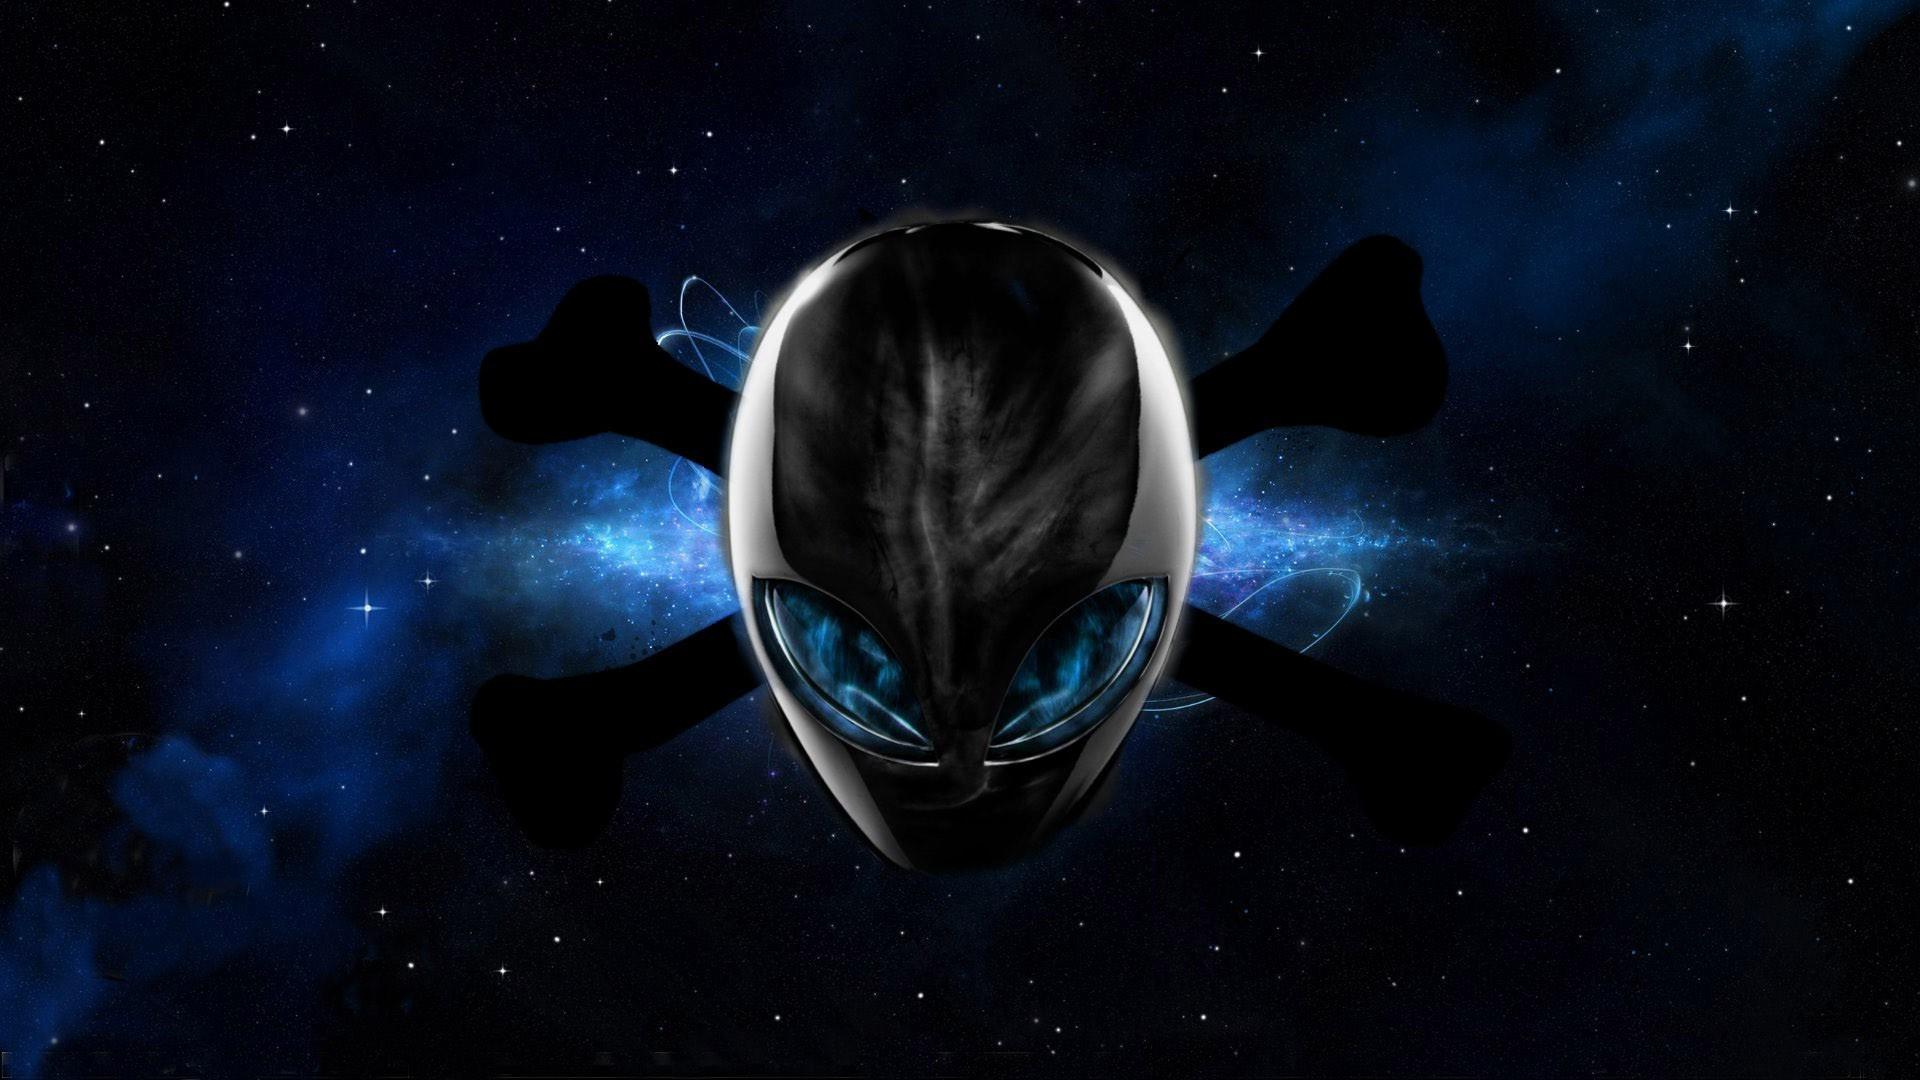 space, Universe, Aliens, Digital Art, Stars, Skull And Bones, Nebula, Alienware  Wallpapers HD / Desktop and Mobile Backgrounds